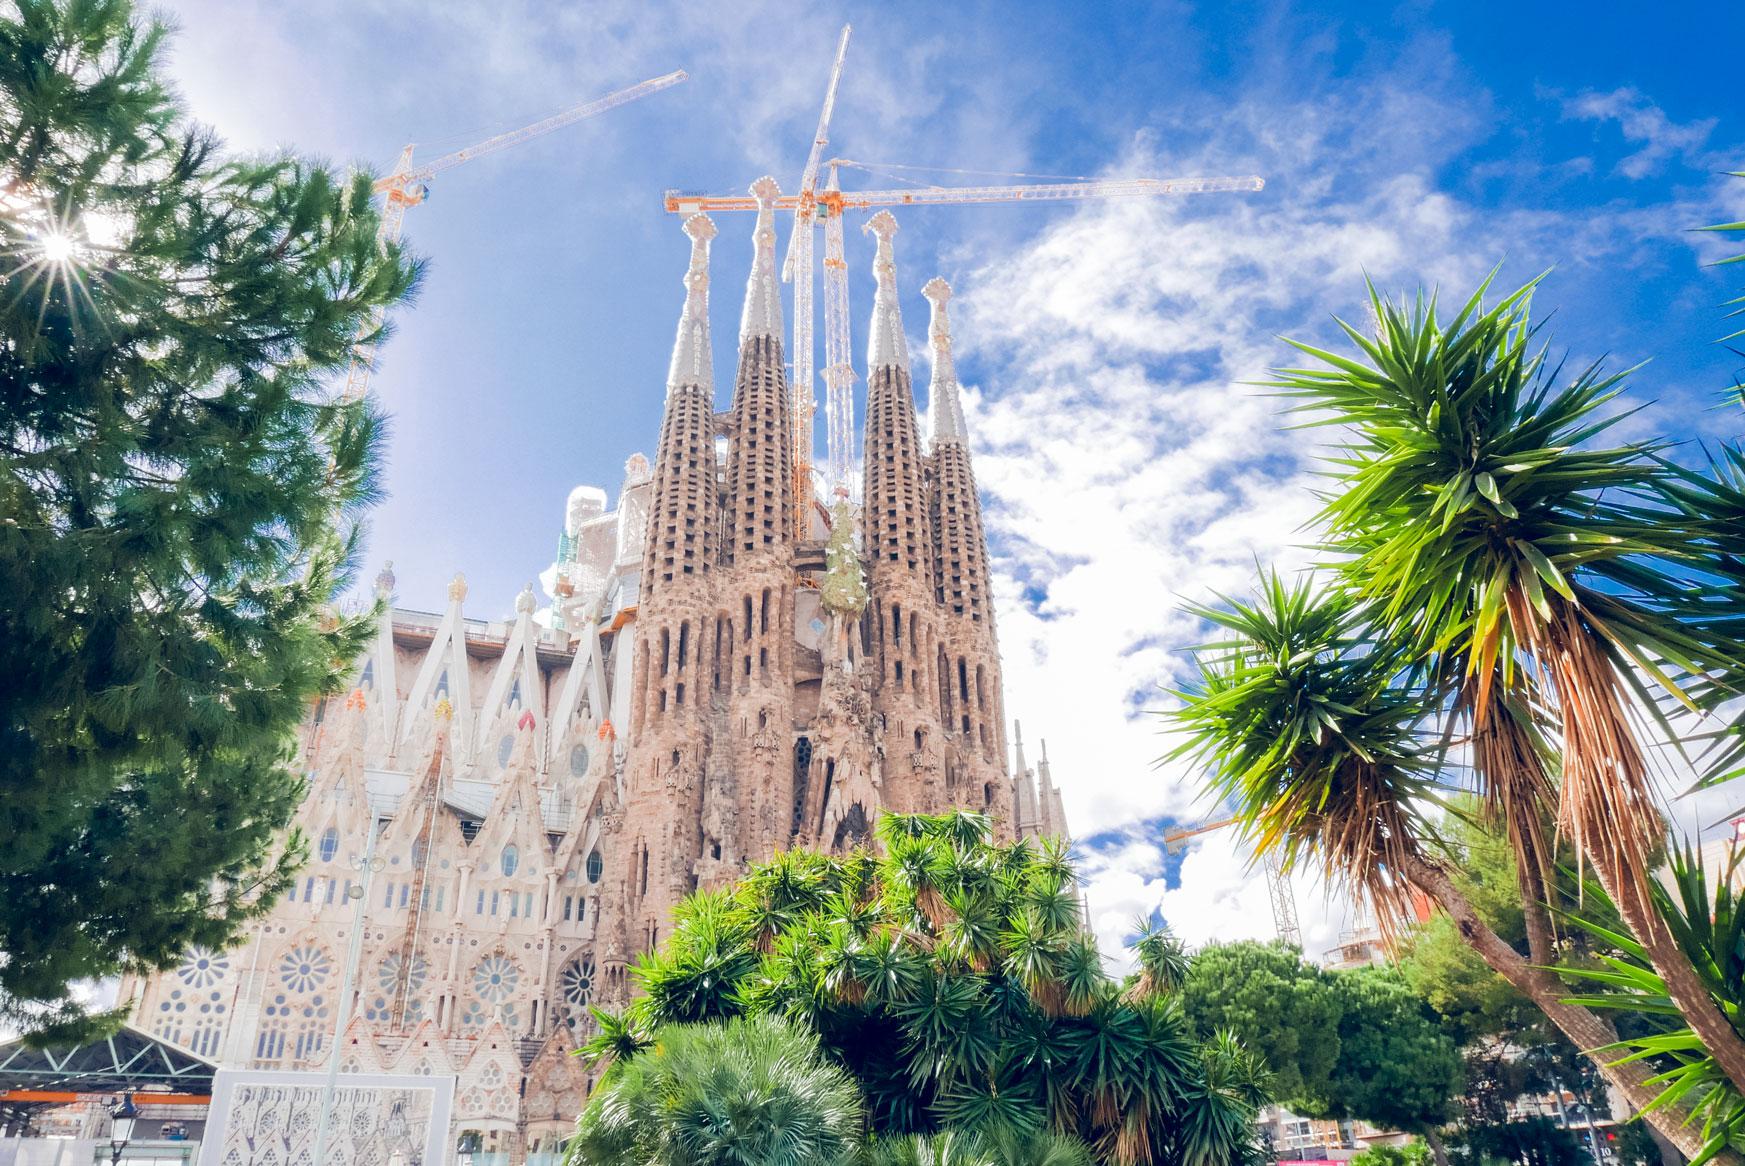 Spain Barcelona Sagrada familia13